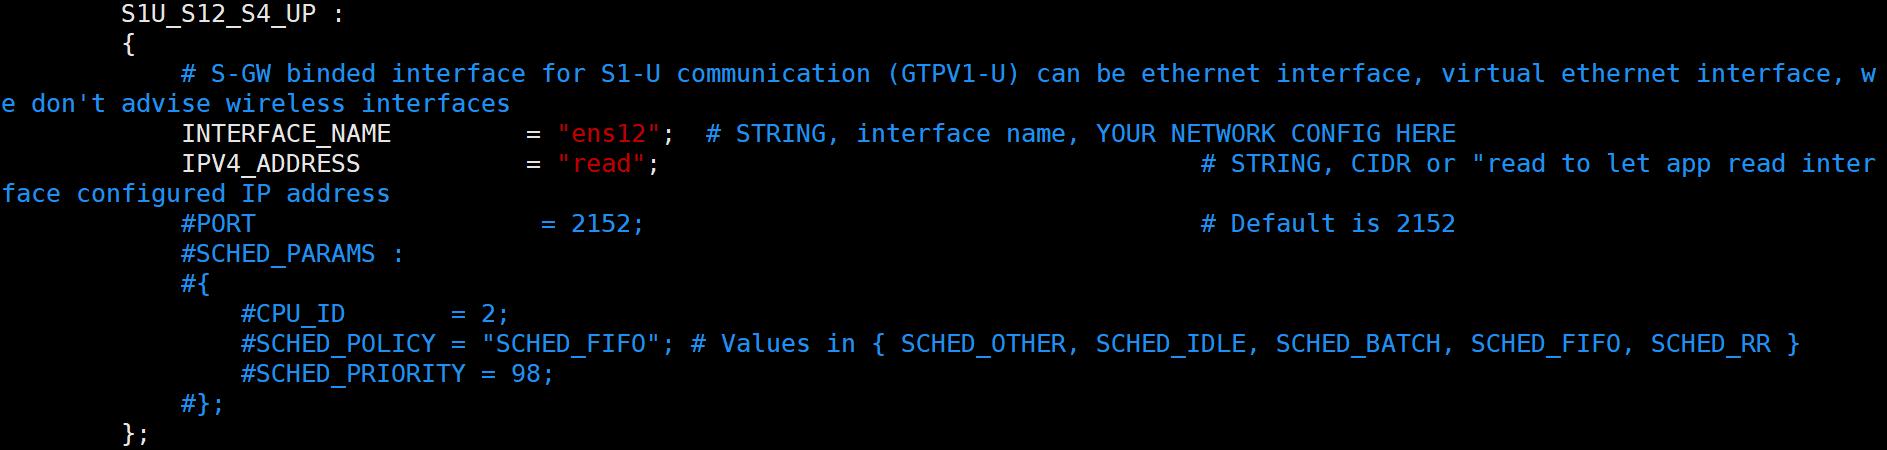 docs/images/virtual-machine/cots-ue/bupt/spgwu_s4.png